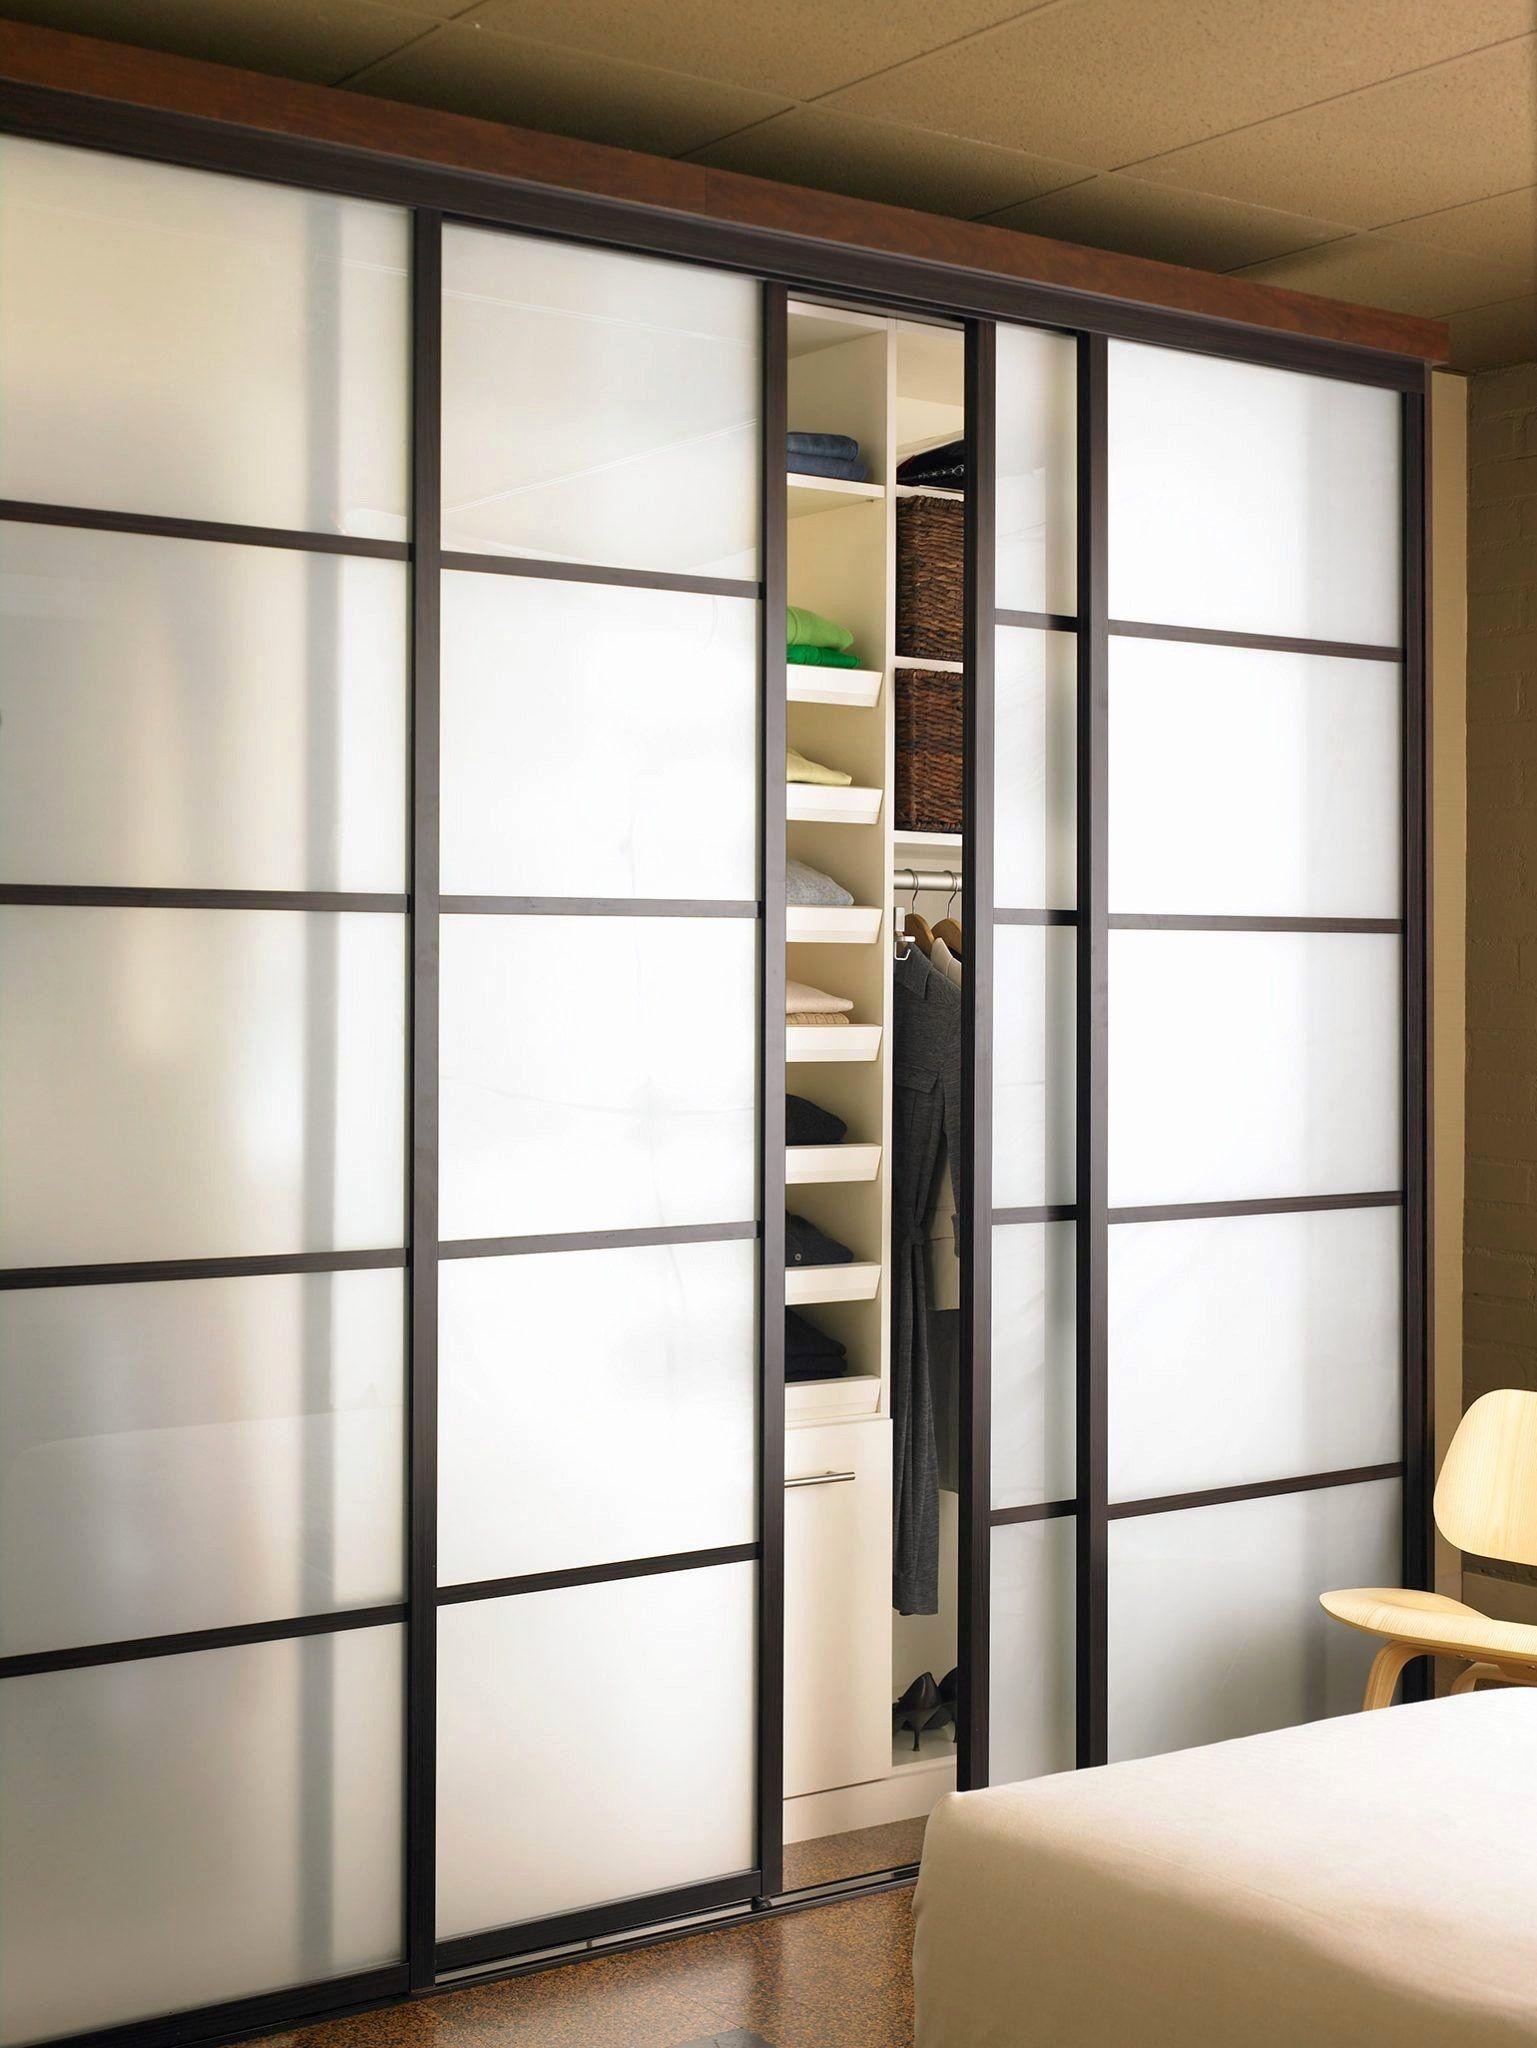 Bedroom Closets With Sliding Doors Unique 20 Best Closet Door Ideas That Won The Modern Closet Doors Ikea Wardrobes Sliding Doors Bedroom Closet Doors Sliding